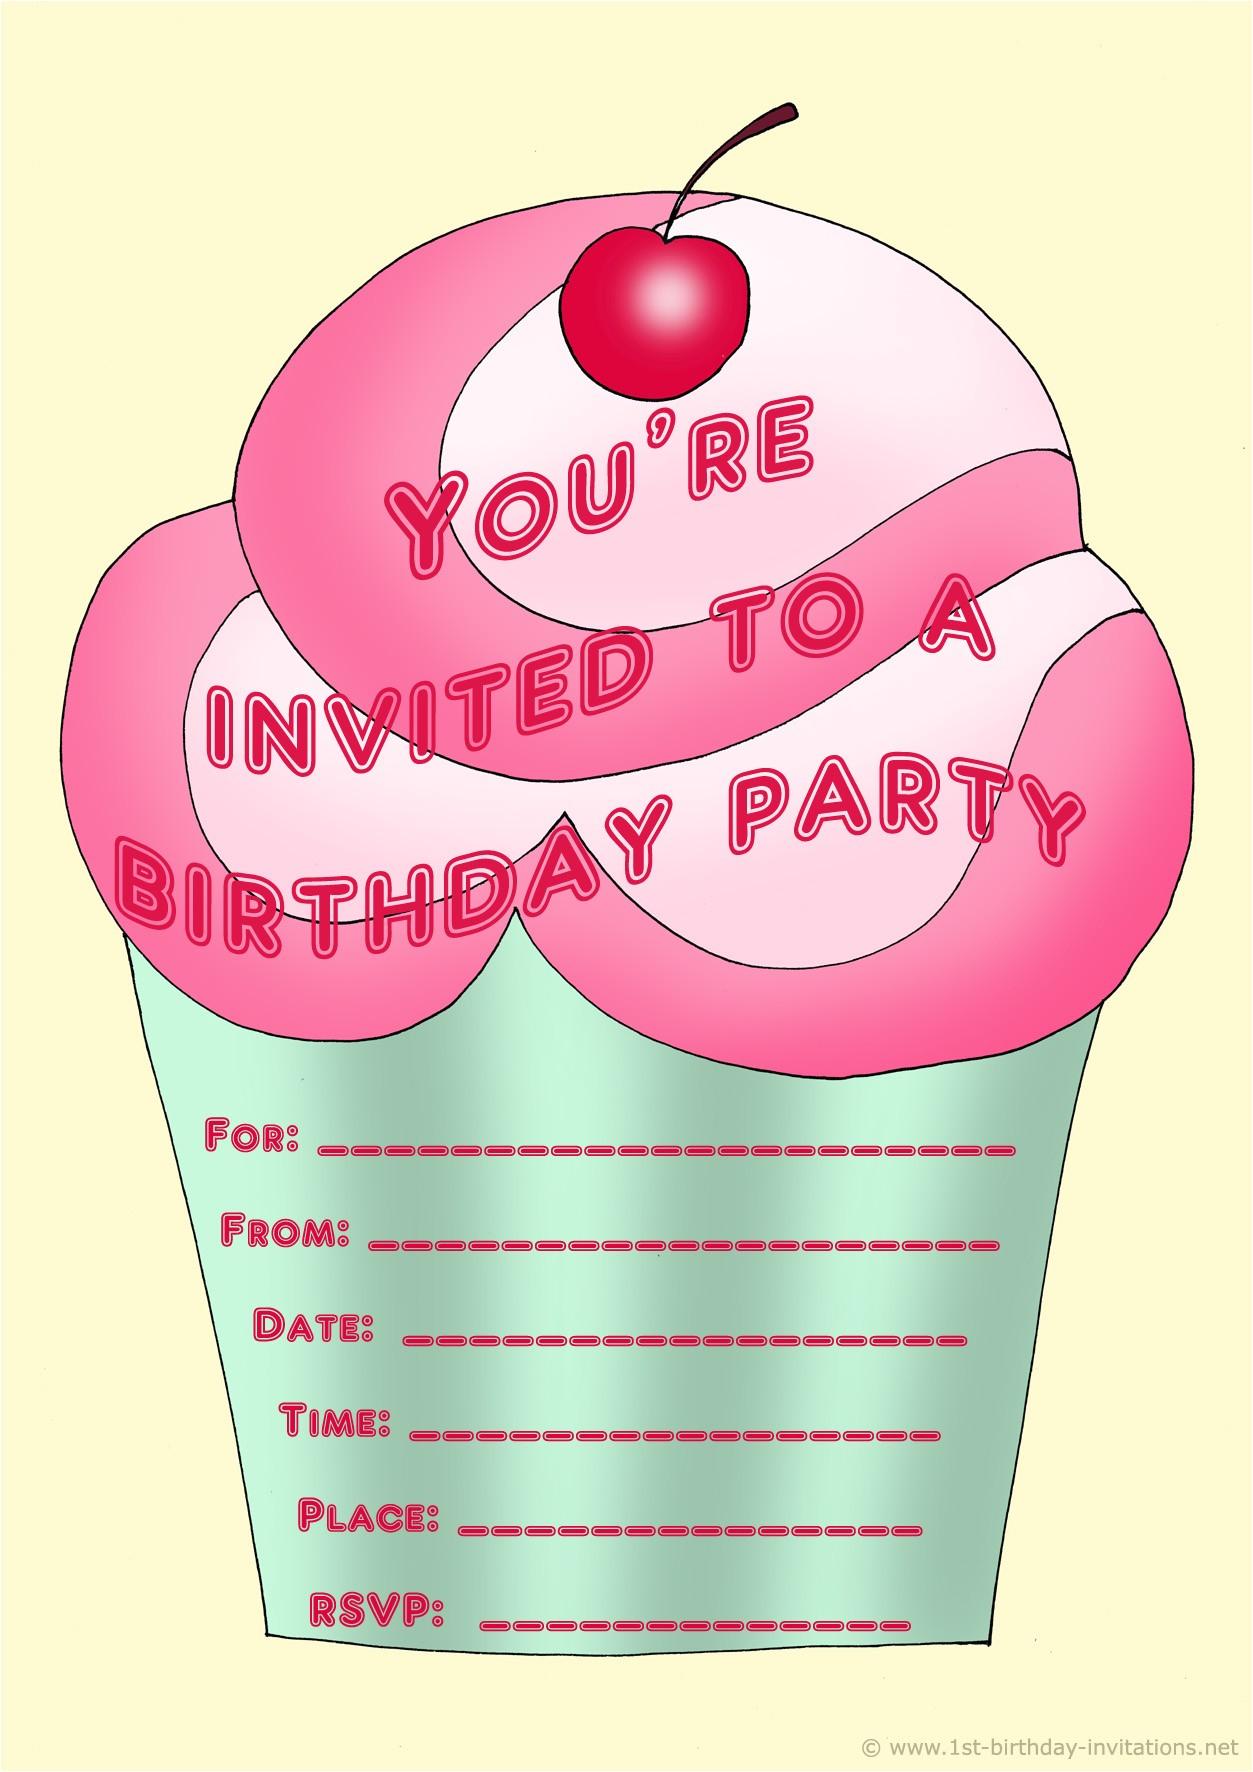 personalized birthday invitations